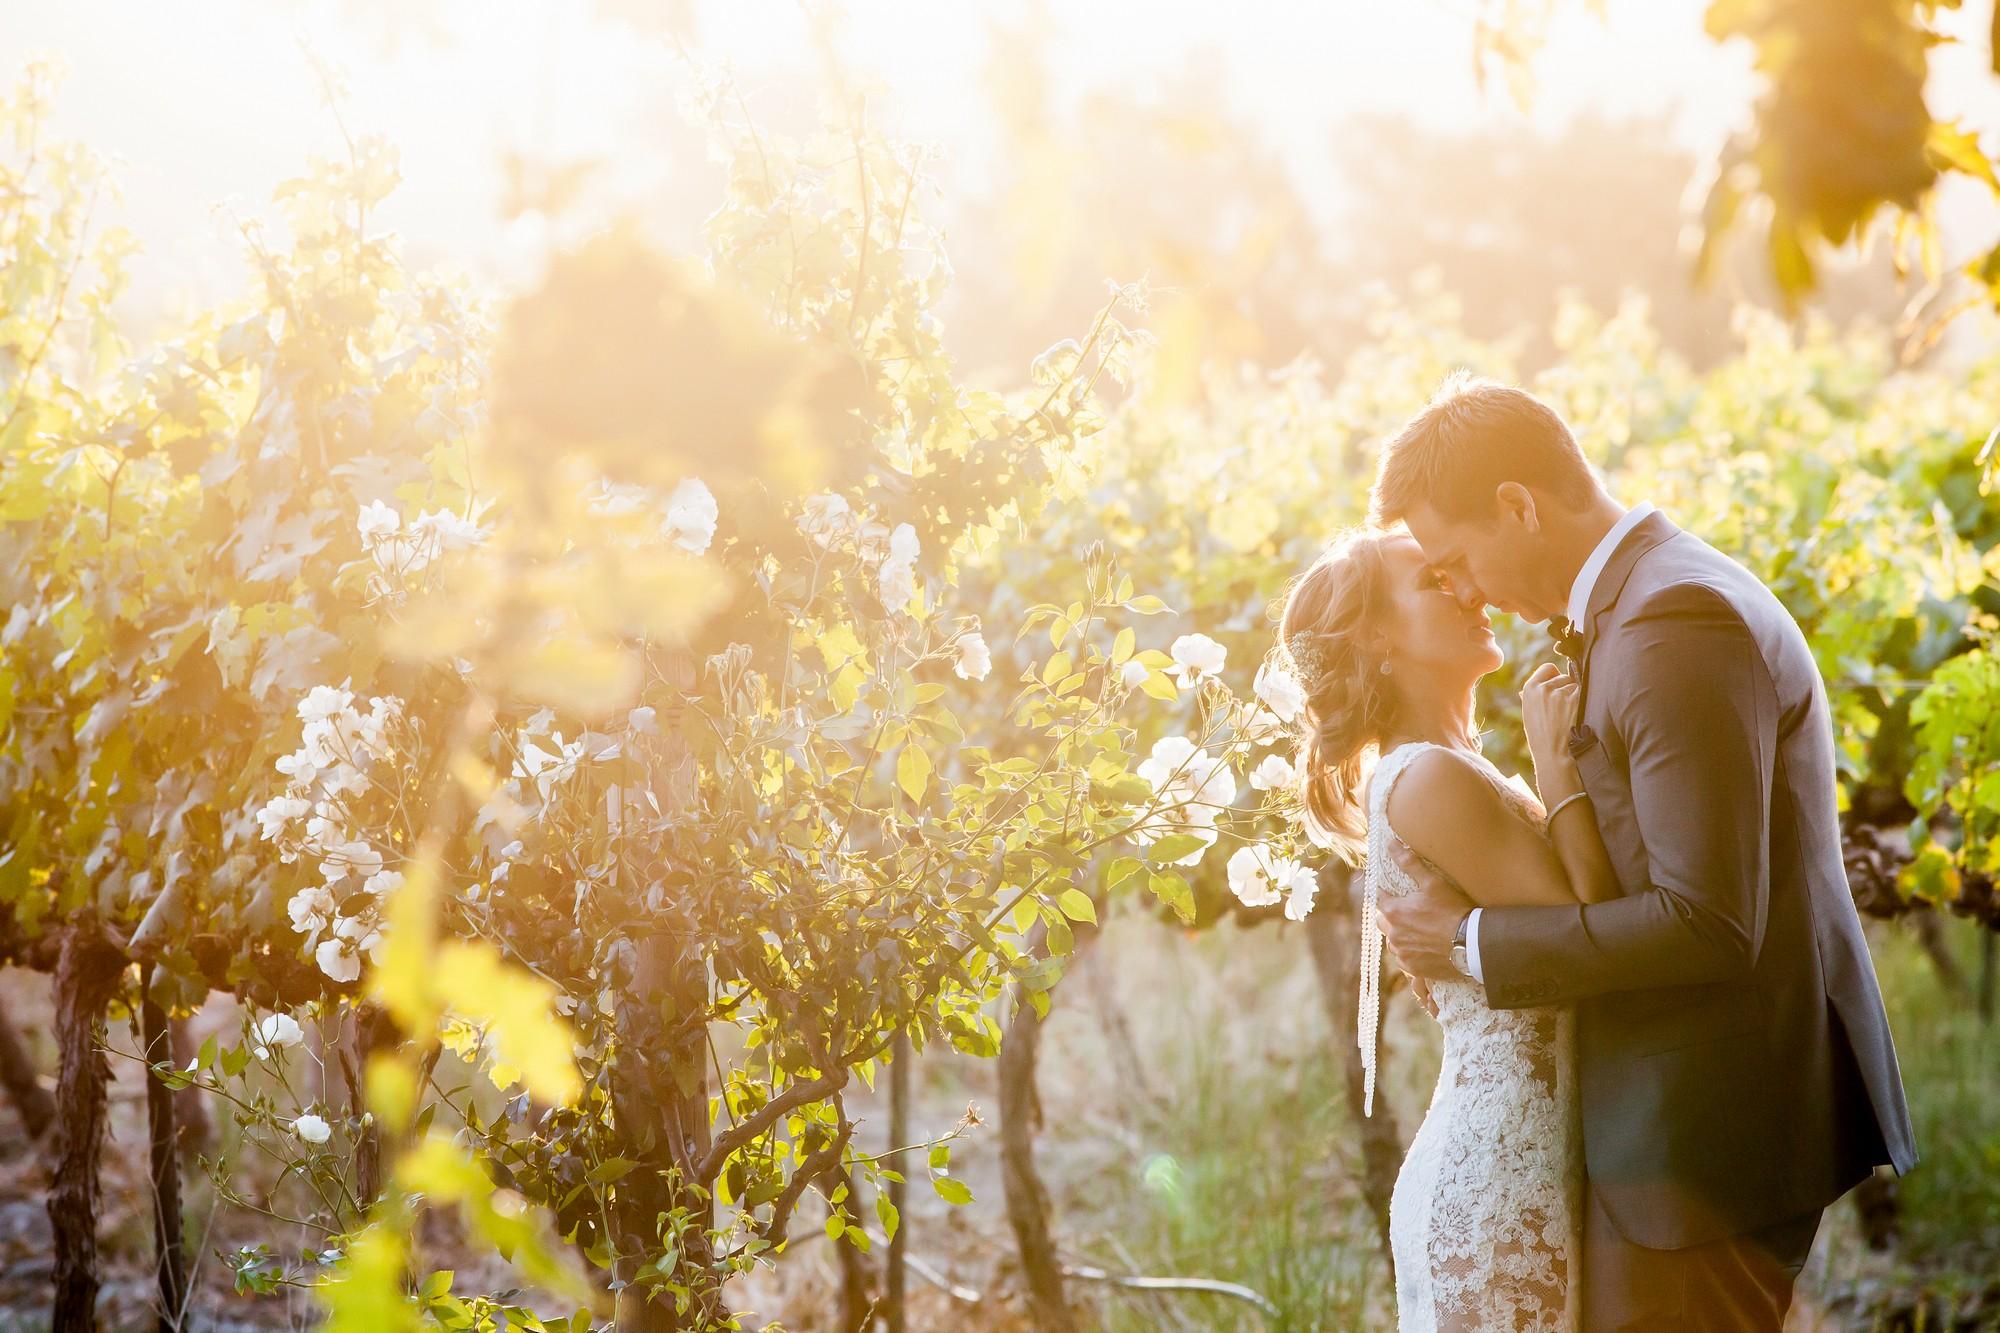 vrede-en-lust-wedding-expressions-photography-02